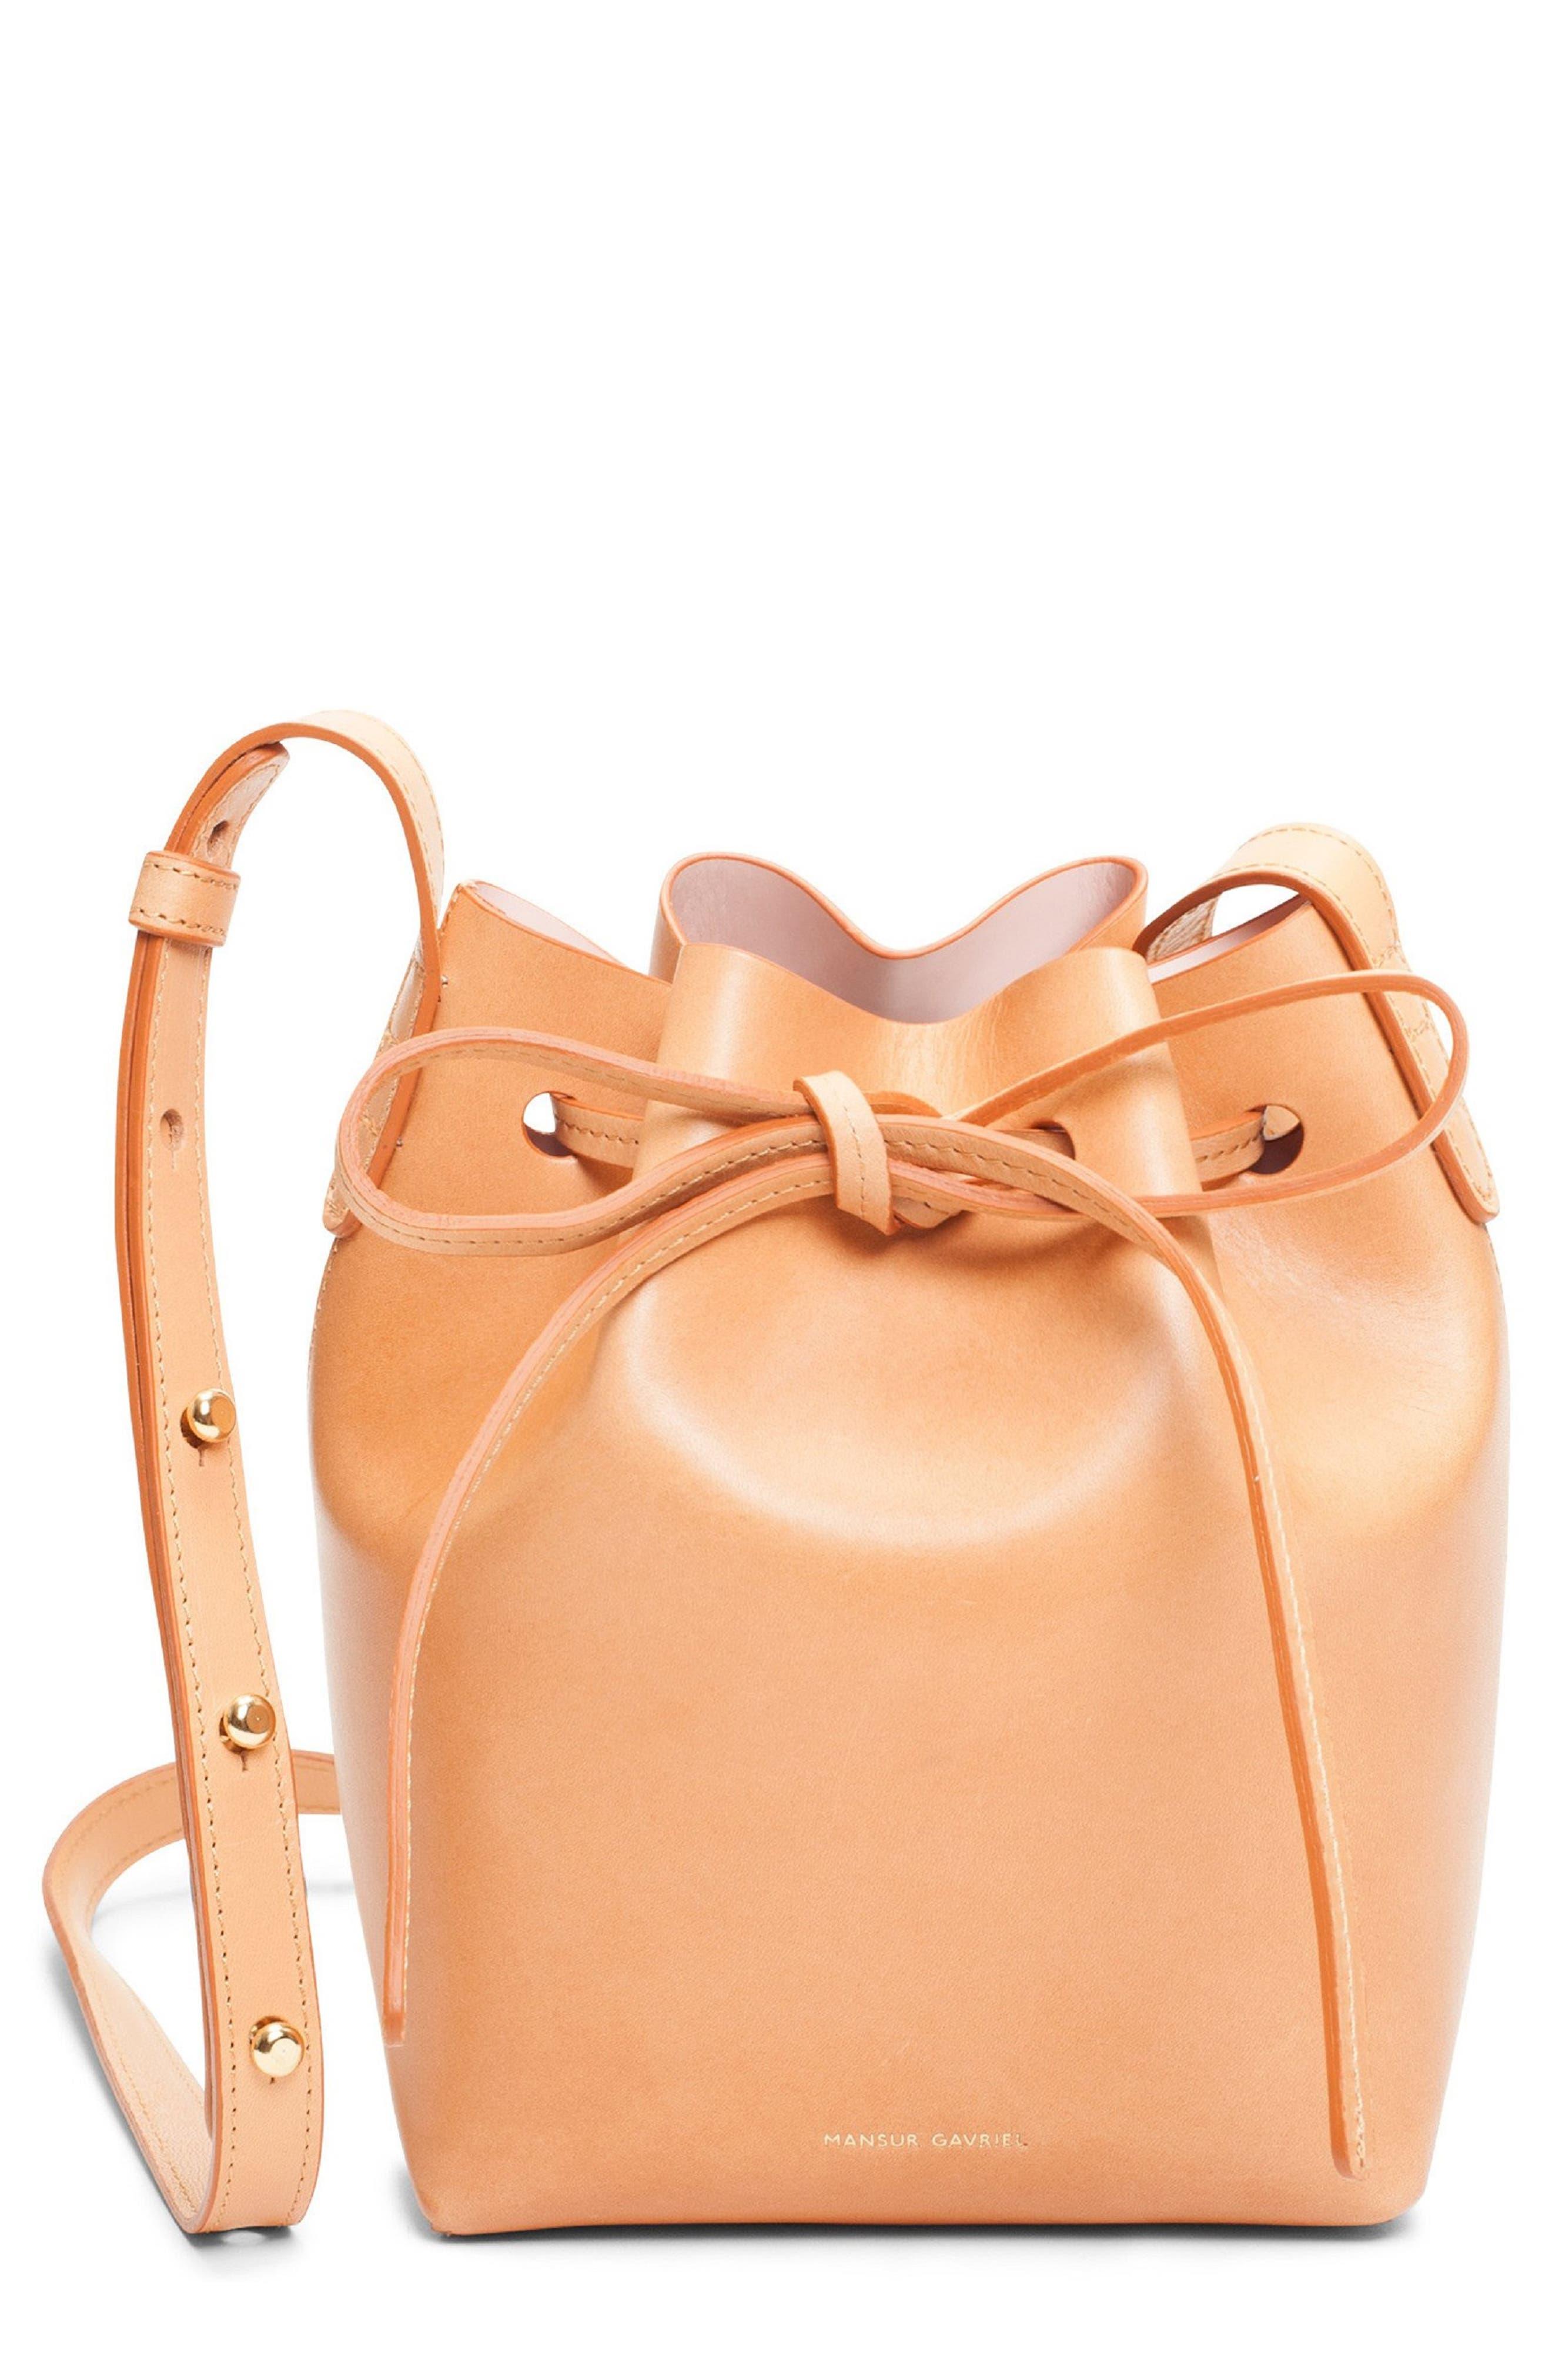 MANSUR GAVRIEL Mini Mini Leather Bucket Bag, Main, color, CAMMELLO/ ROSA